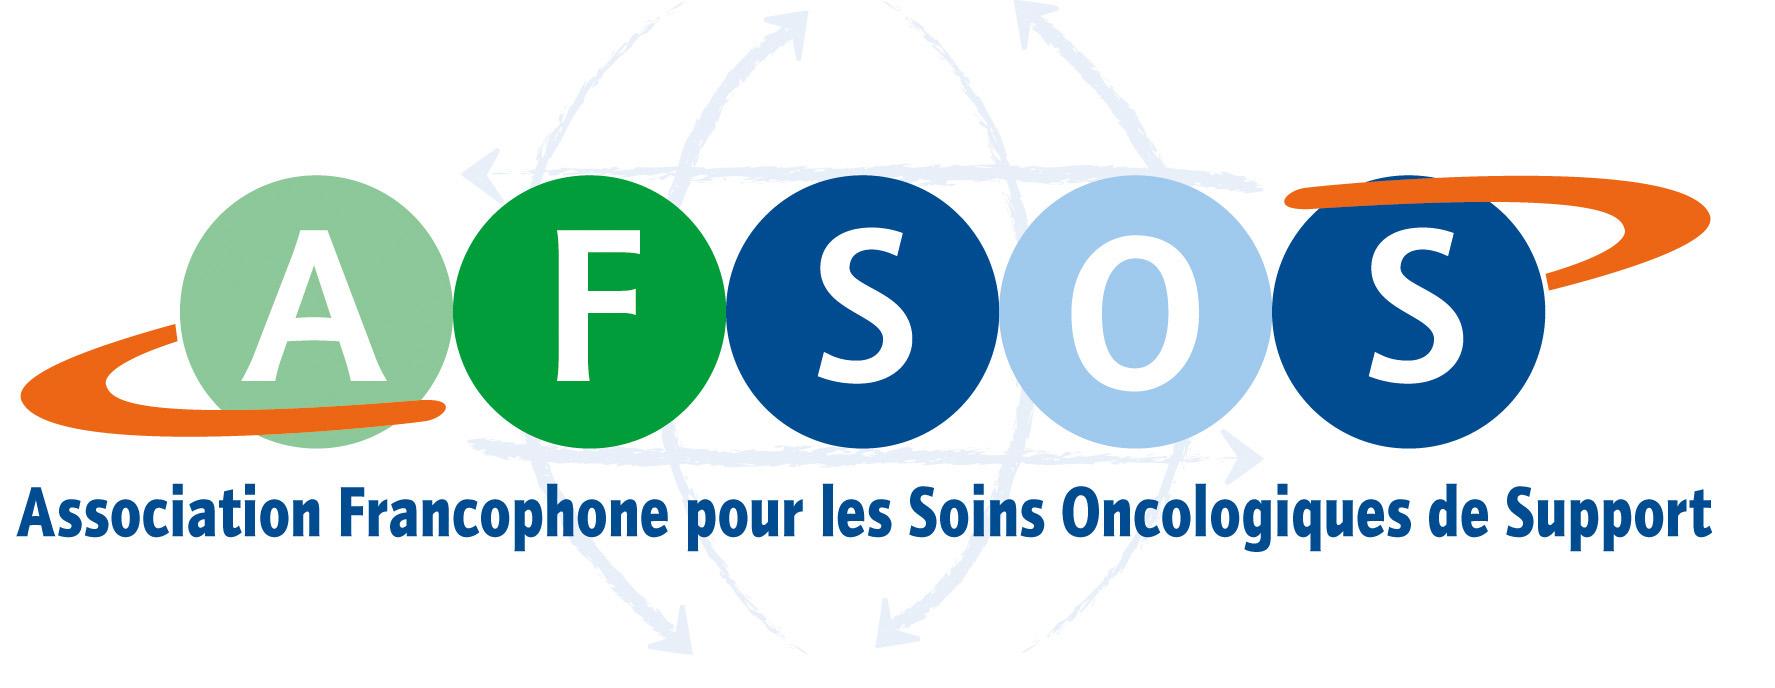 7ème Congrès National de l'AFSOS - 2015